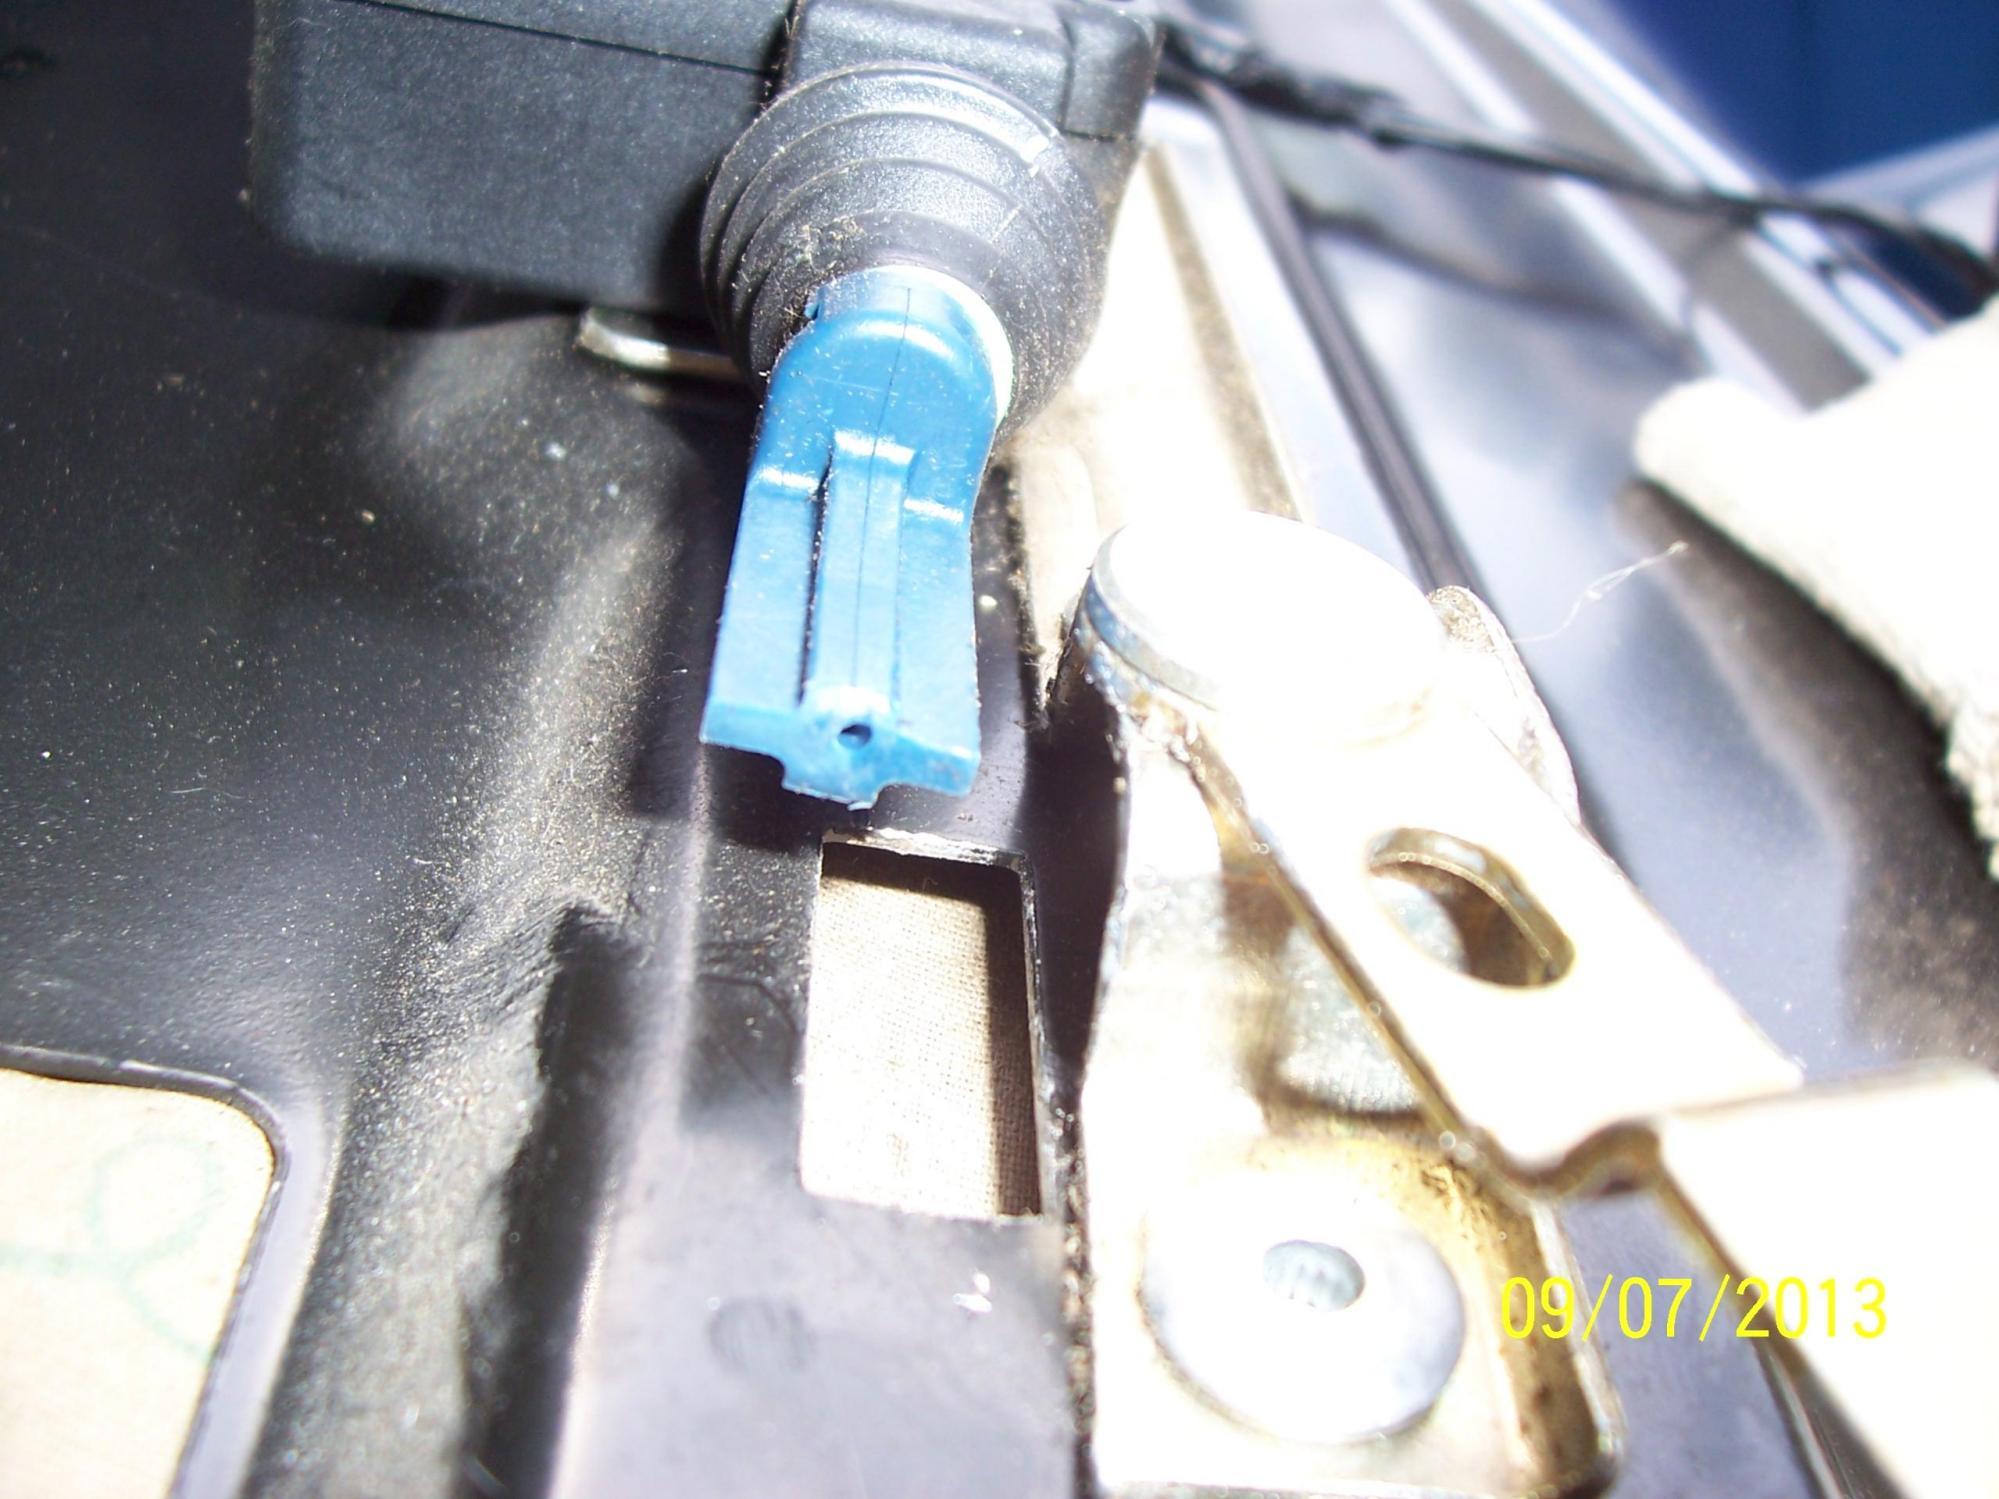 hight resolution of  2003 blazer rear liftgate glass actuator 100 2882 jpg